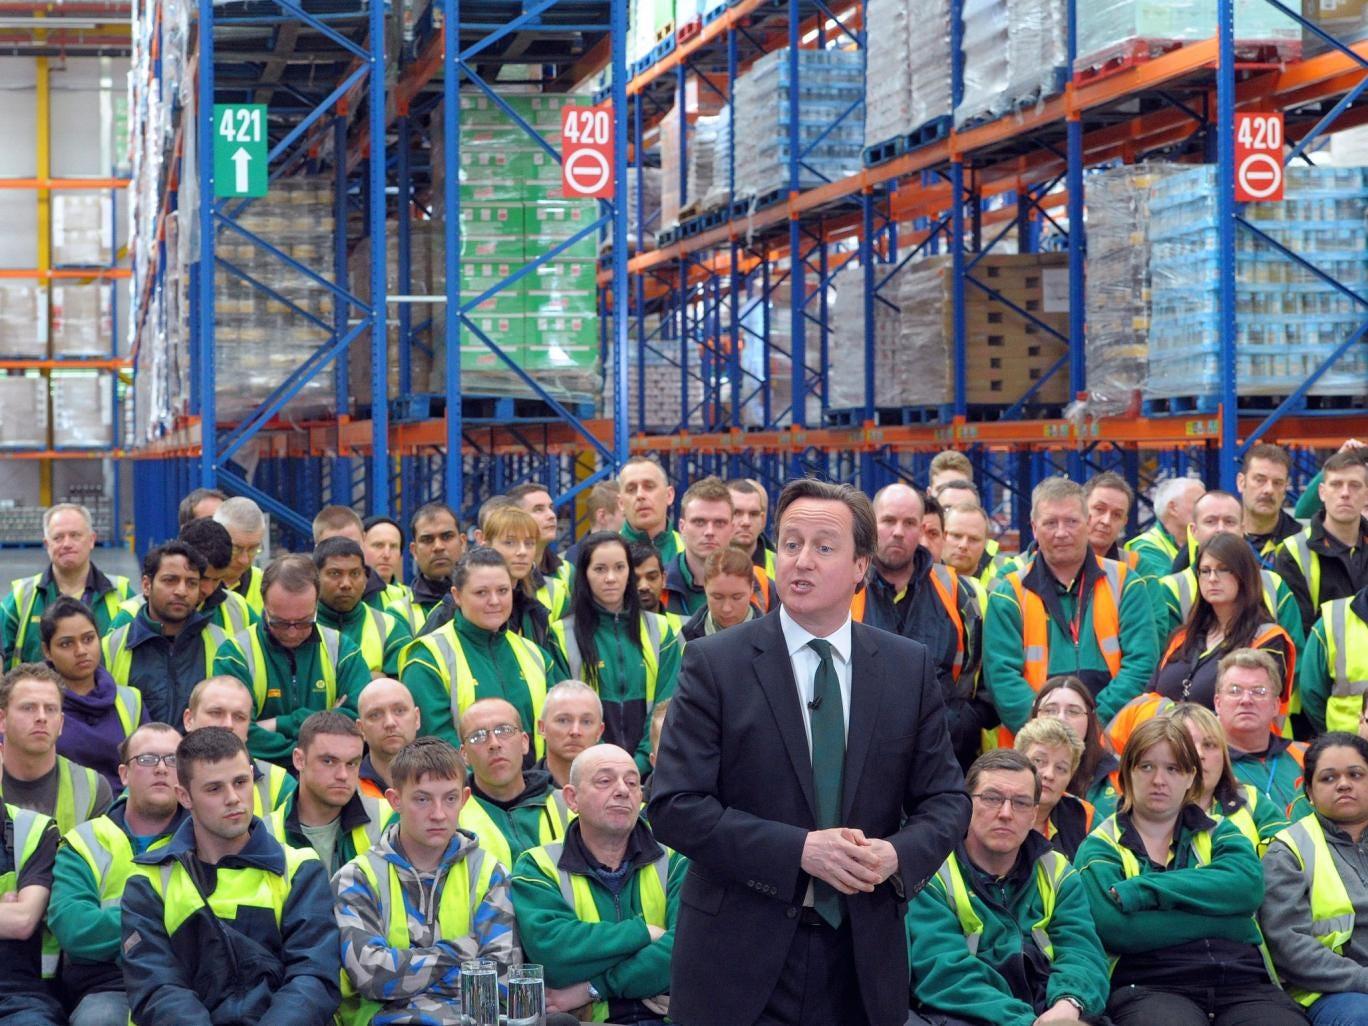 David Cameron speaks to Morrisons workers in Somerset